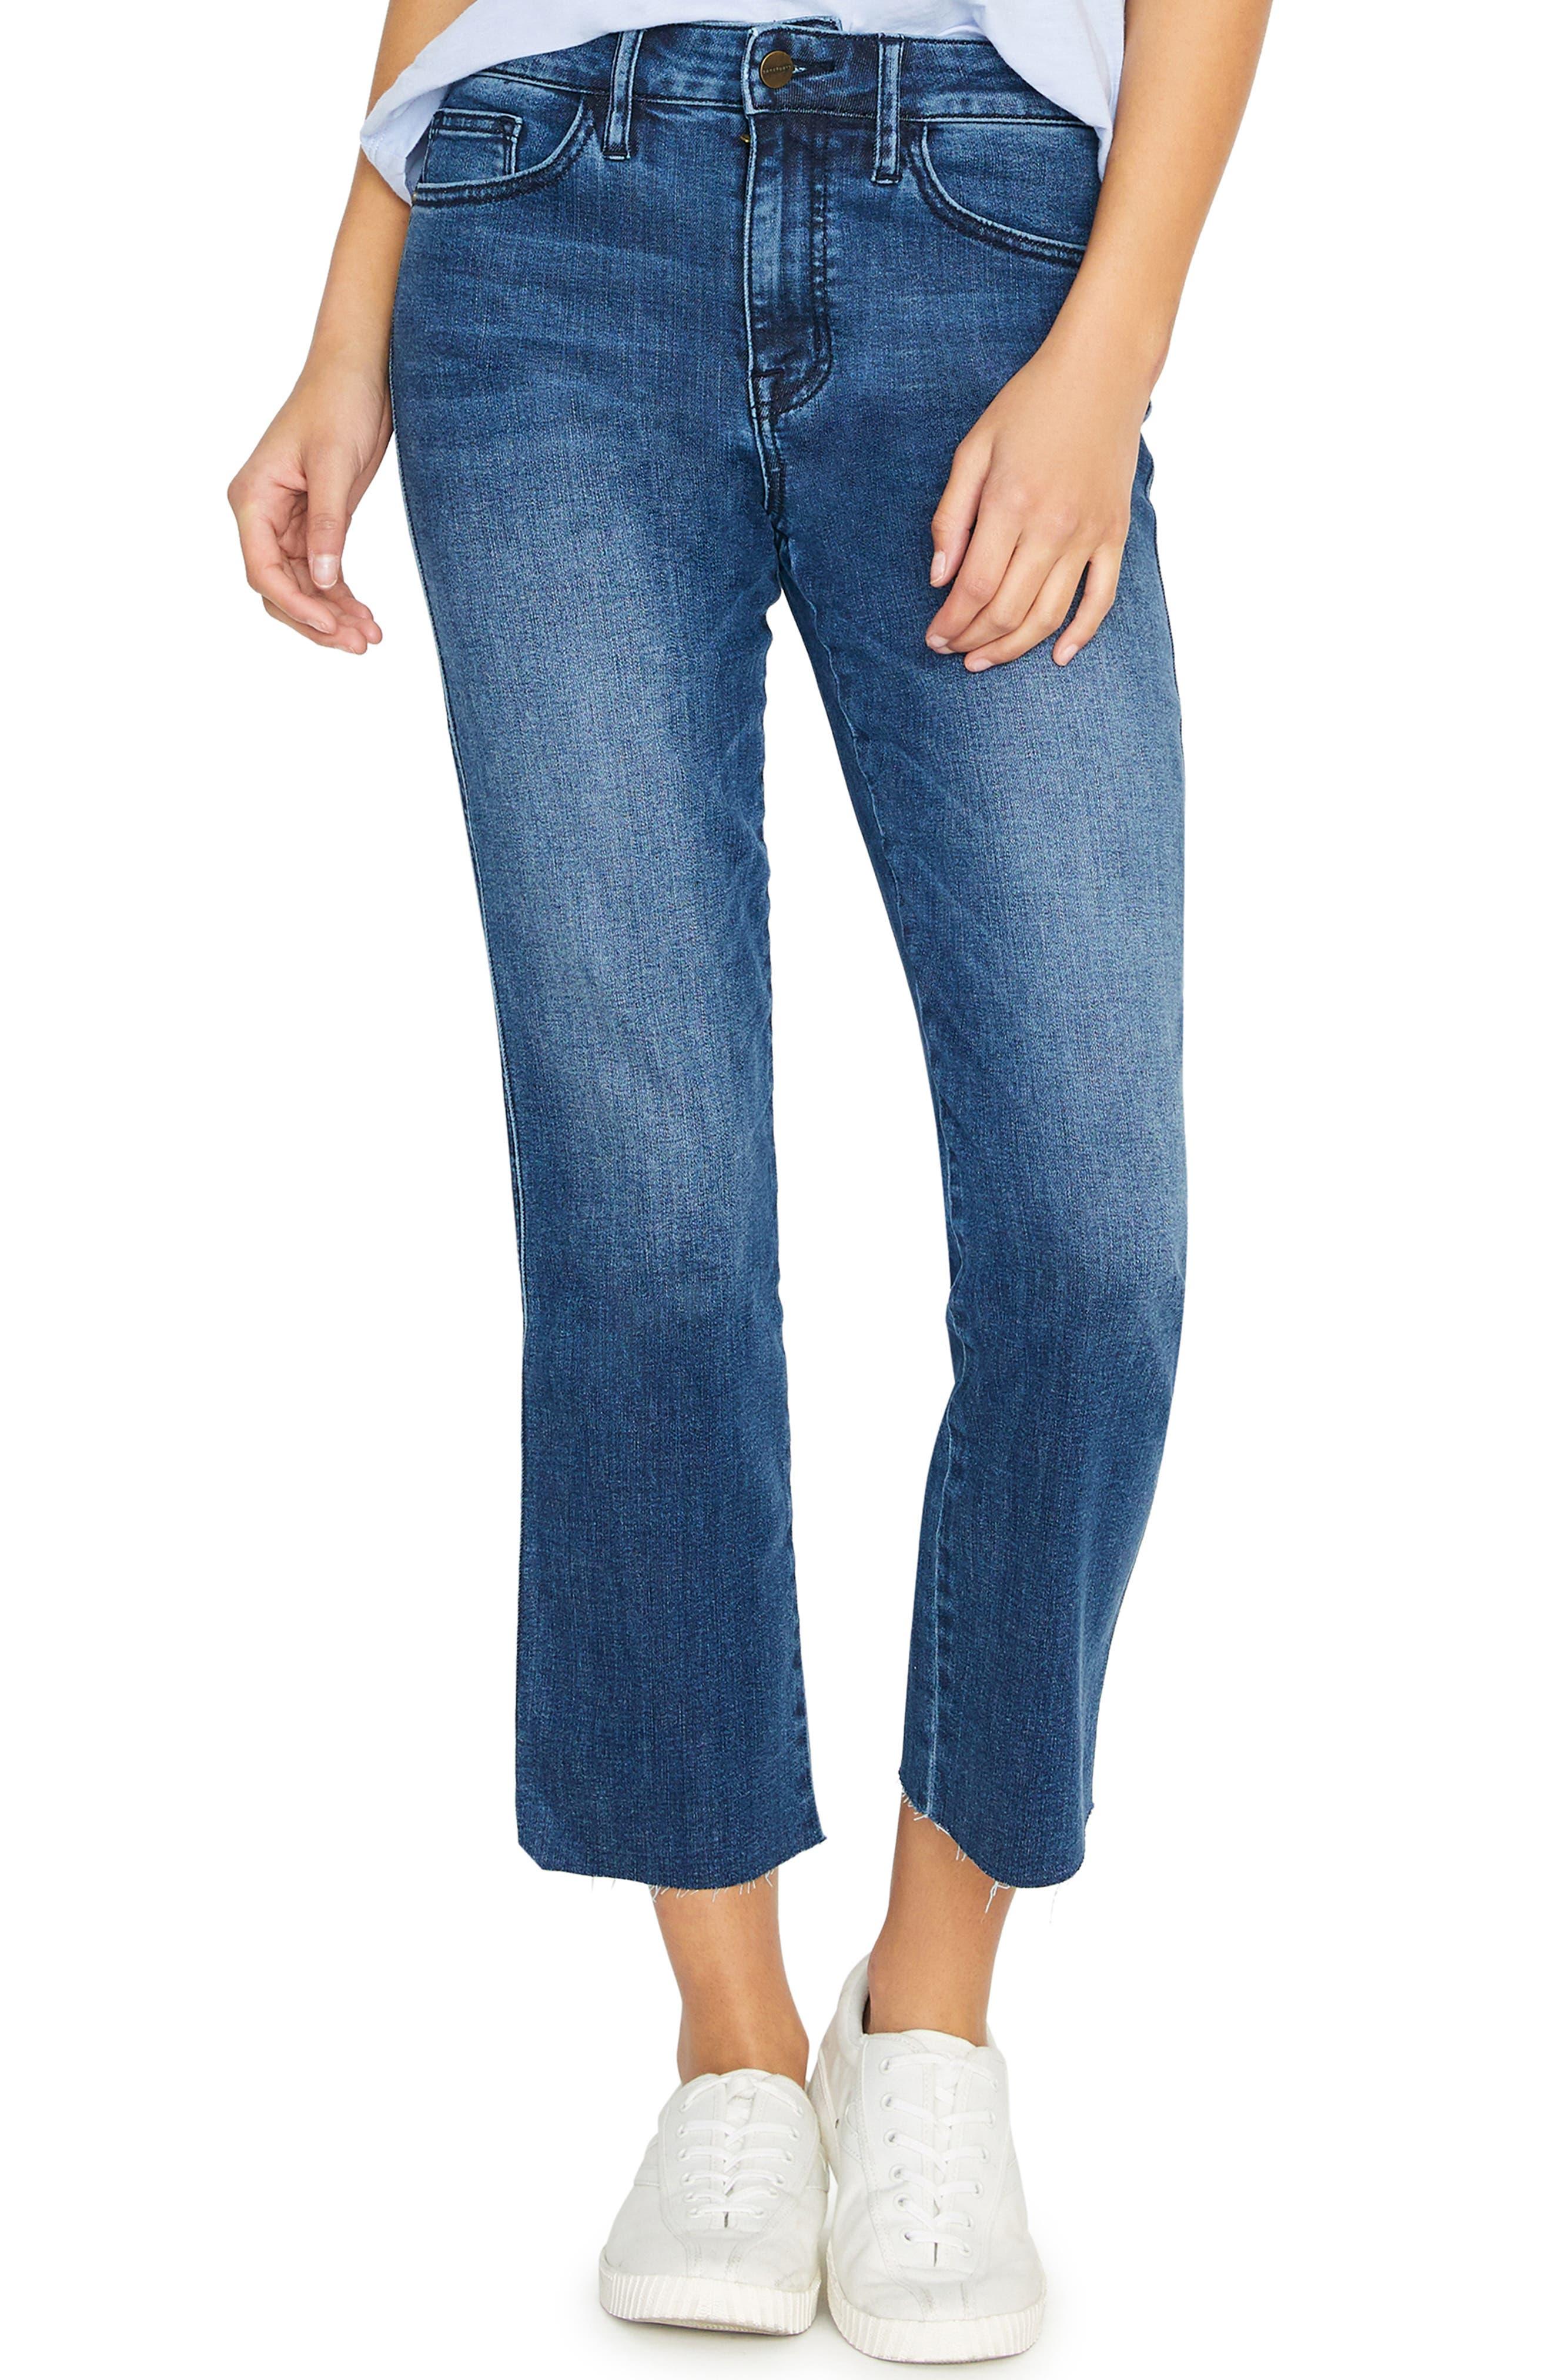 SANCTUARY, Modern Standard High Waist Raw Hem Straight Leg Jeans, Main thumbnail 1, color, ELSINORE BLUE